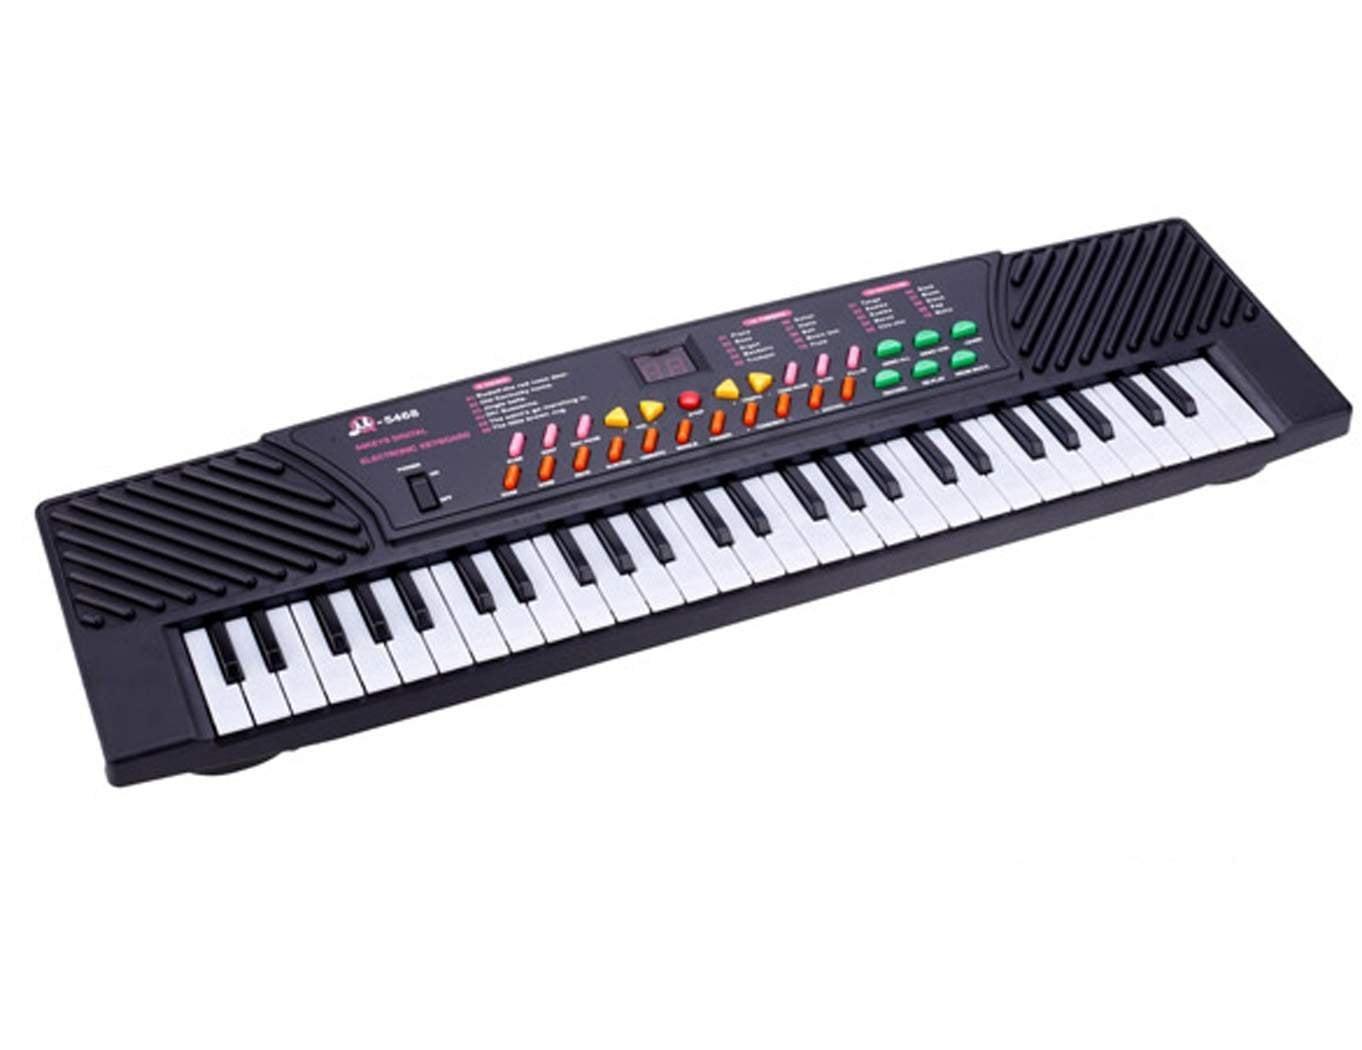 54 Keys Music Electronic Keyboard Kid Electric Piano Organ Record Playback W Mic by AUEY